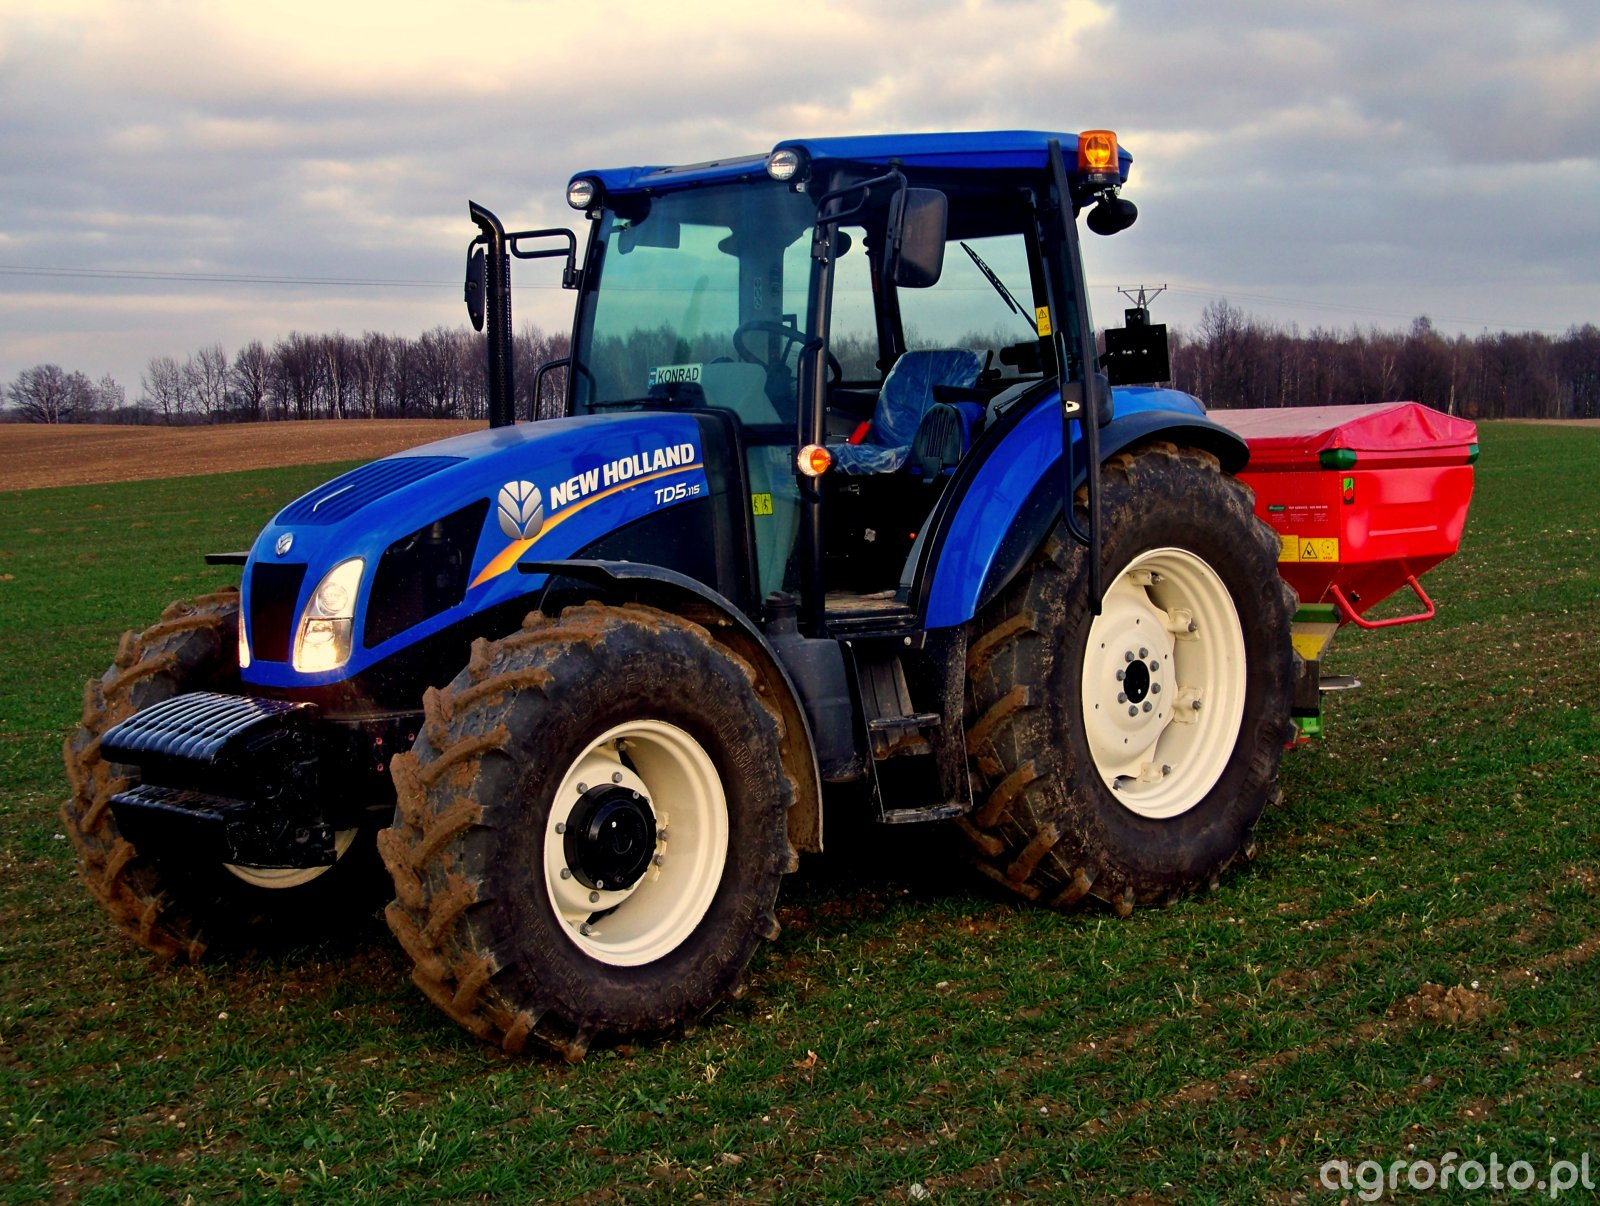 New Holland TD5.115 & Unia Brzeg MX Premium 1200